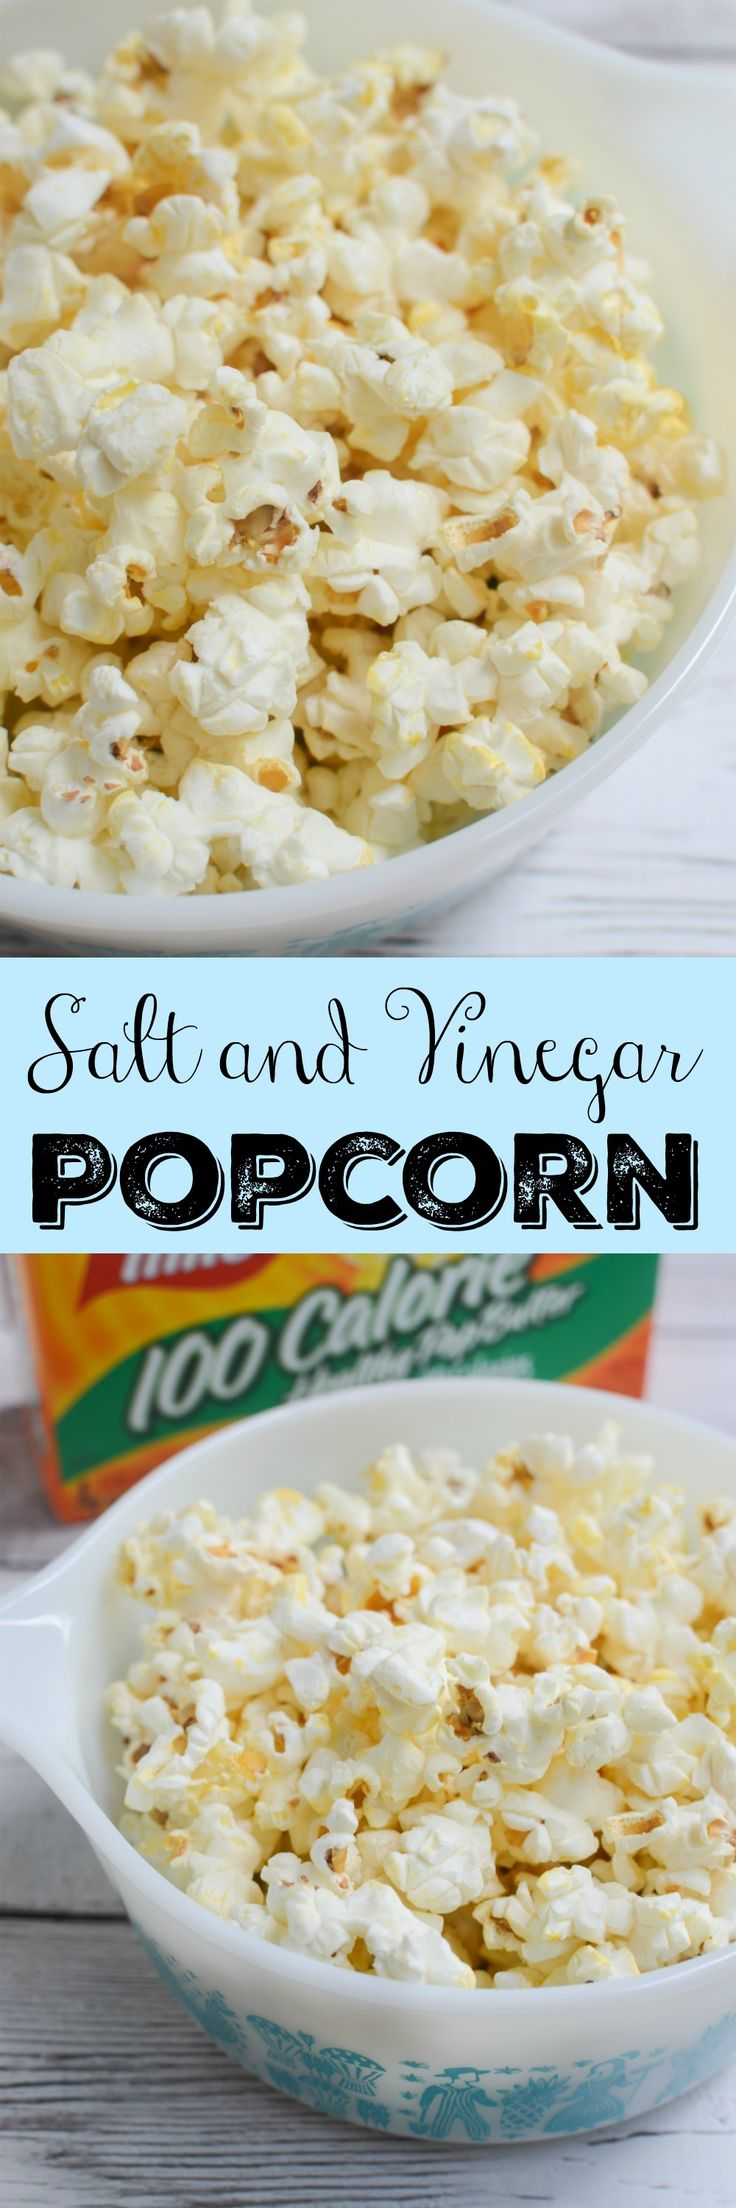 Salt and Vinegar Popcorn - turn a bag of microwaved popcorn into salt and vinegar popcorn in minutes! #weightwatchers #ww #ad: